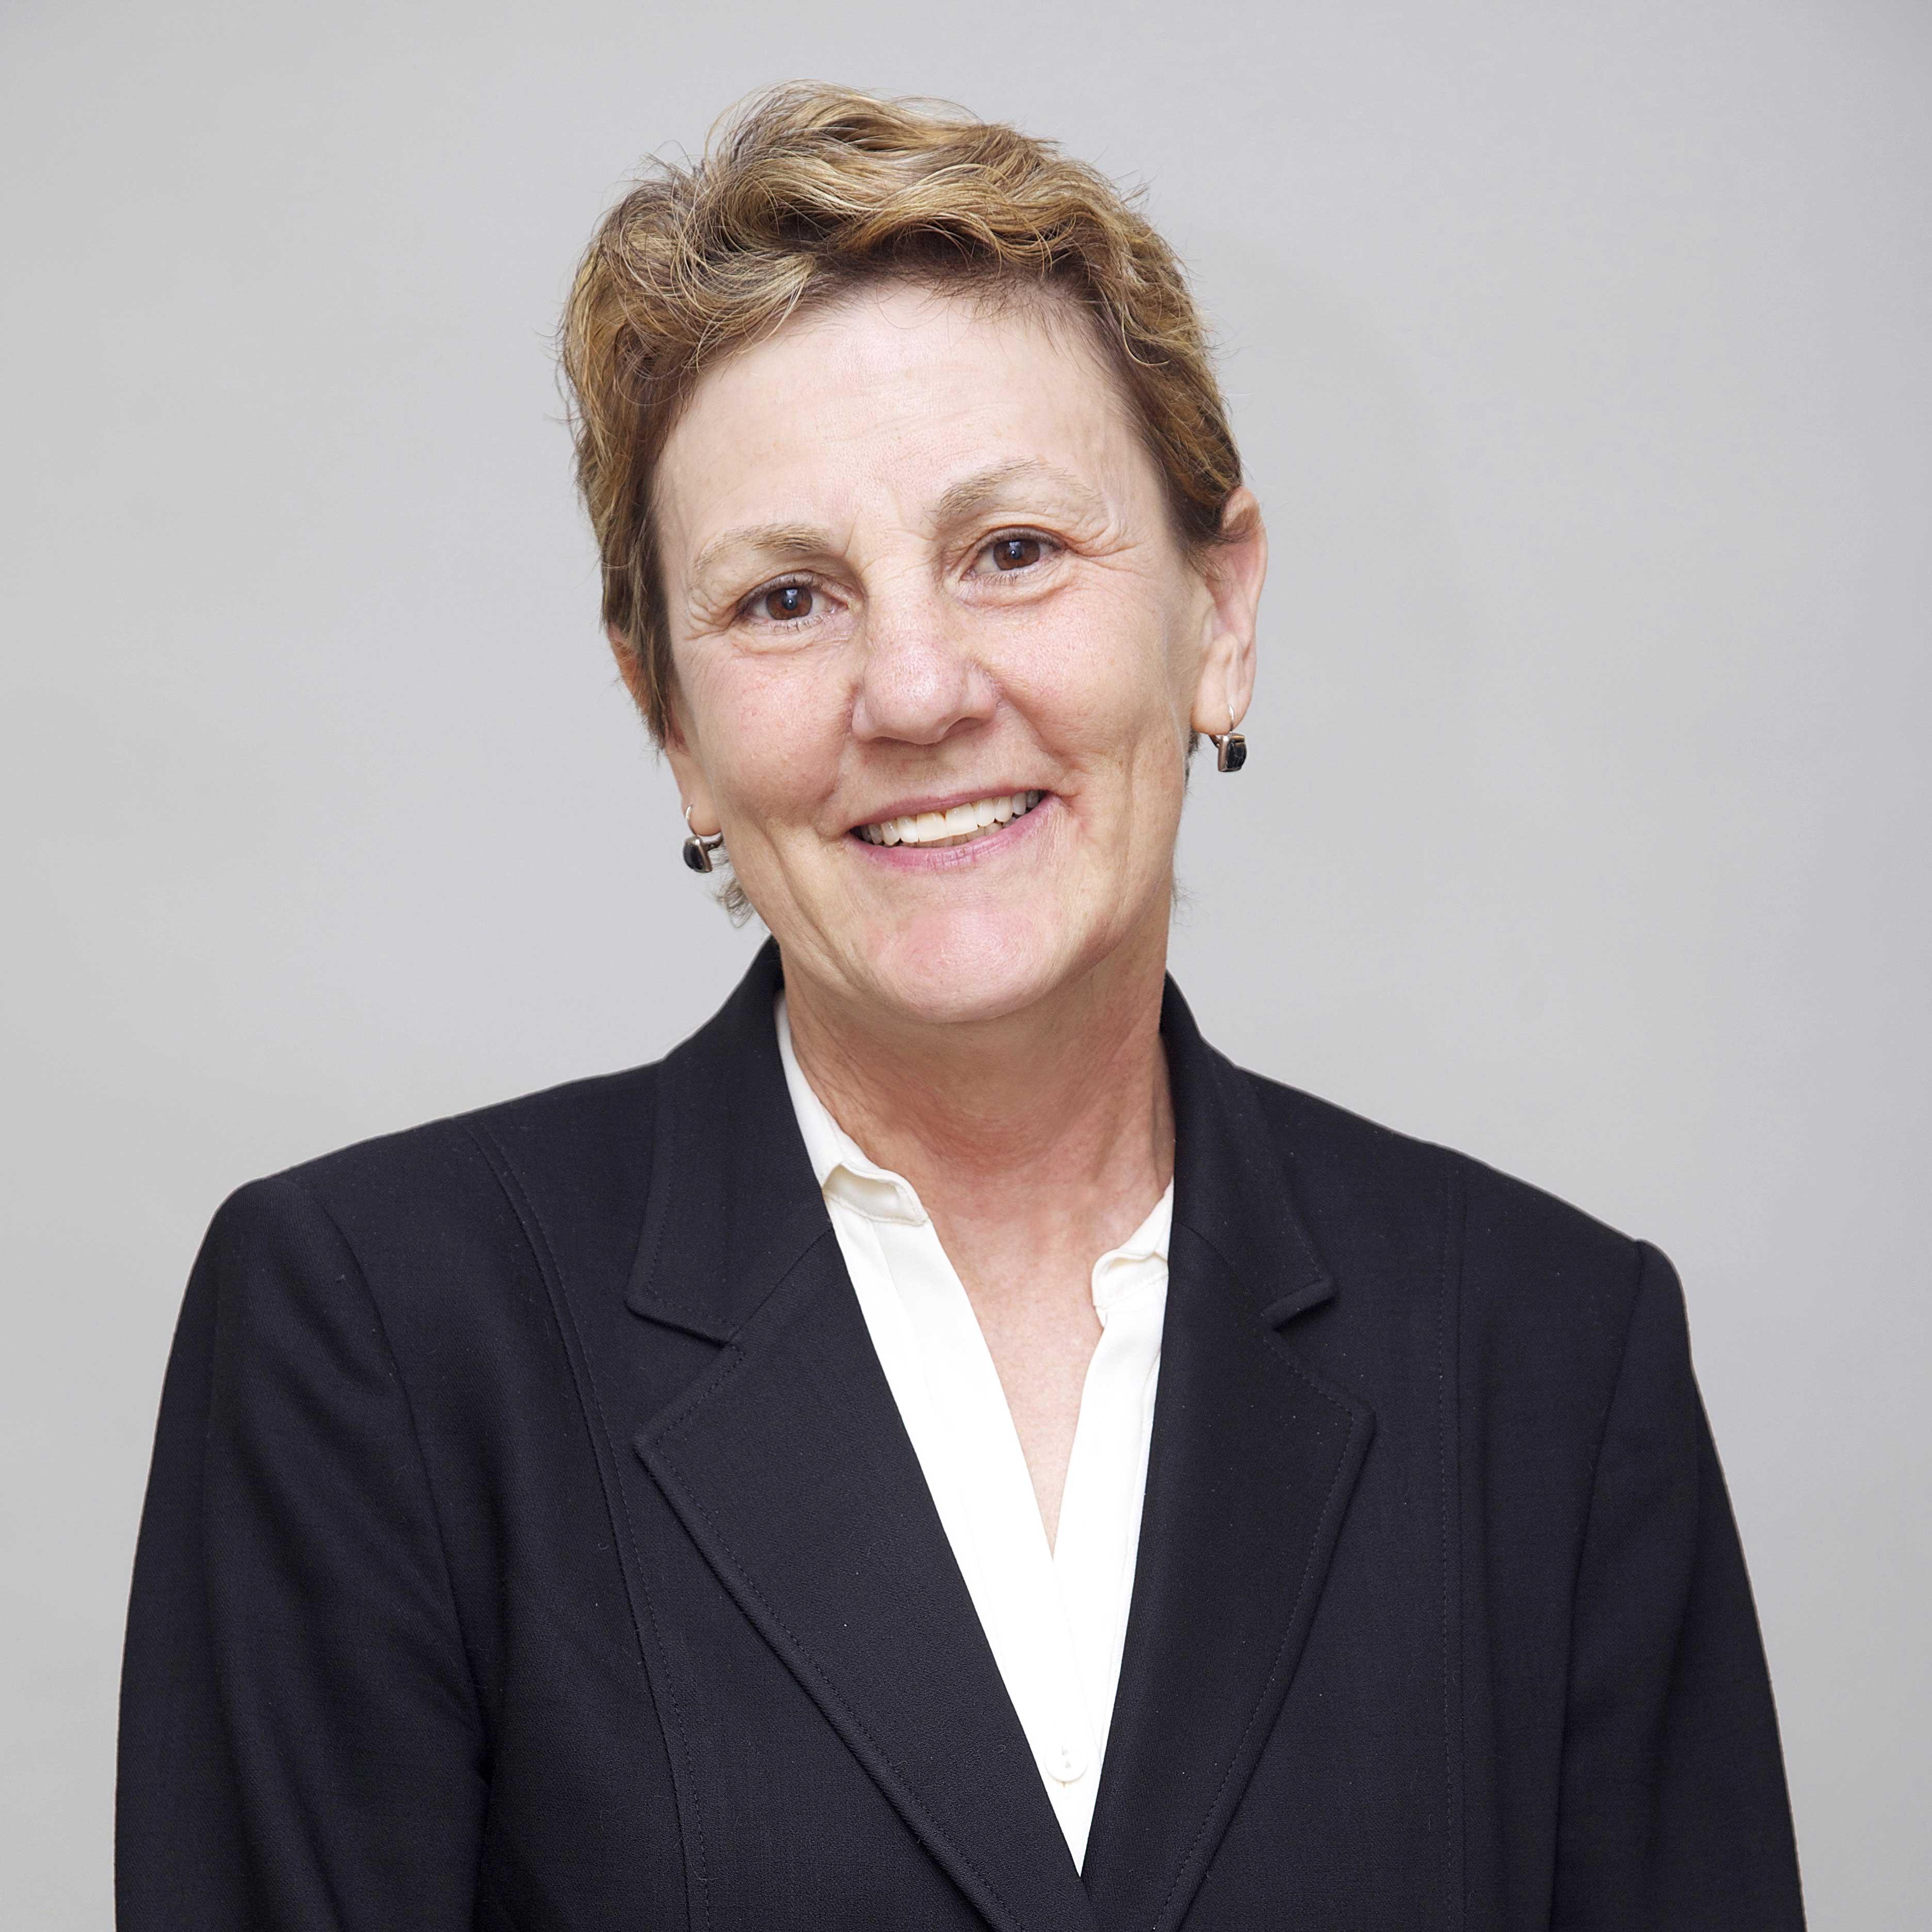 Laurie Mikva